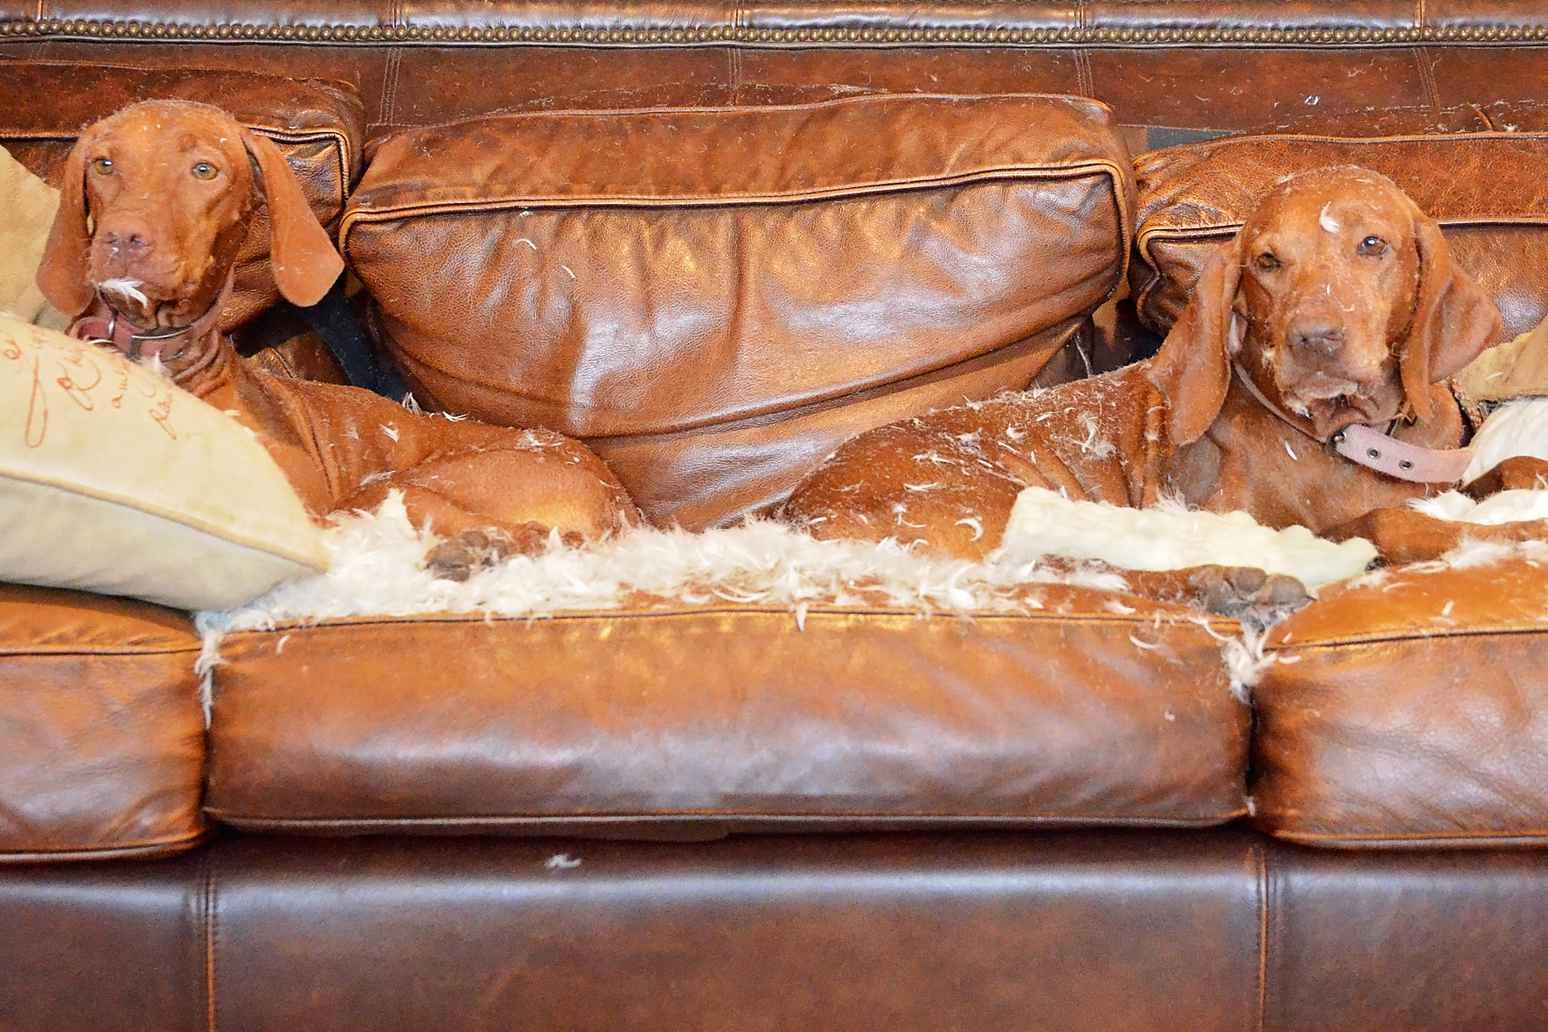 Dos perros salchicha tirado en un sofá en un lío de plumas de cojín.